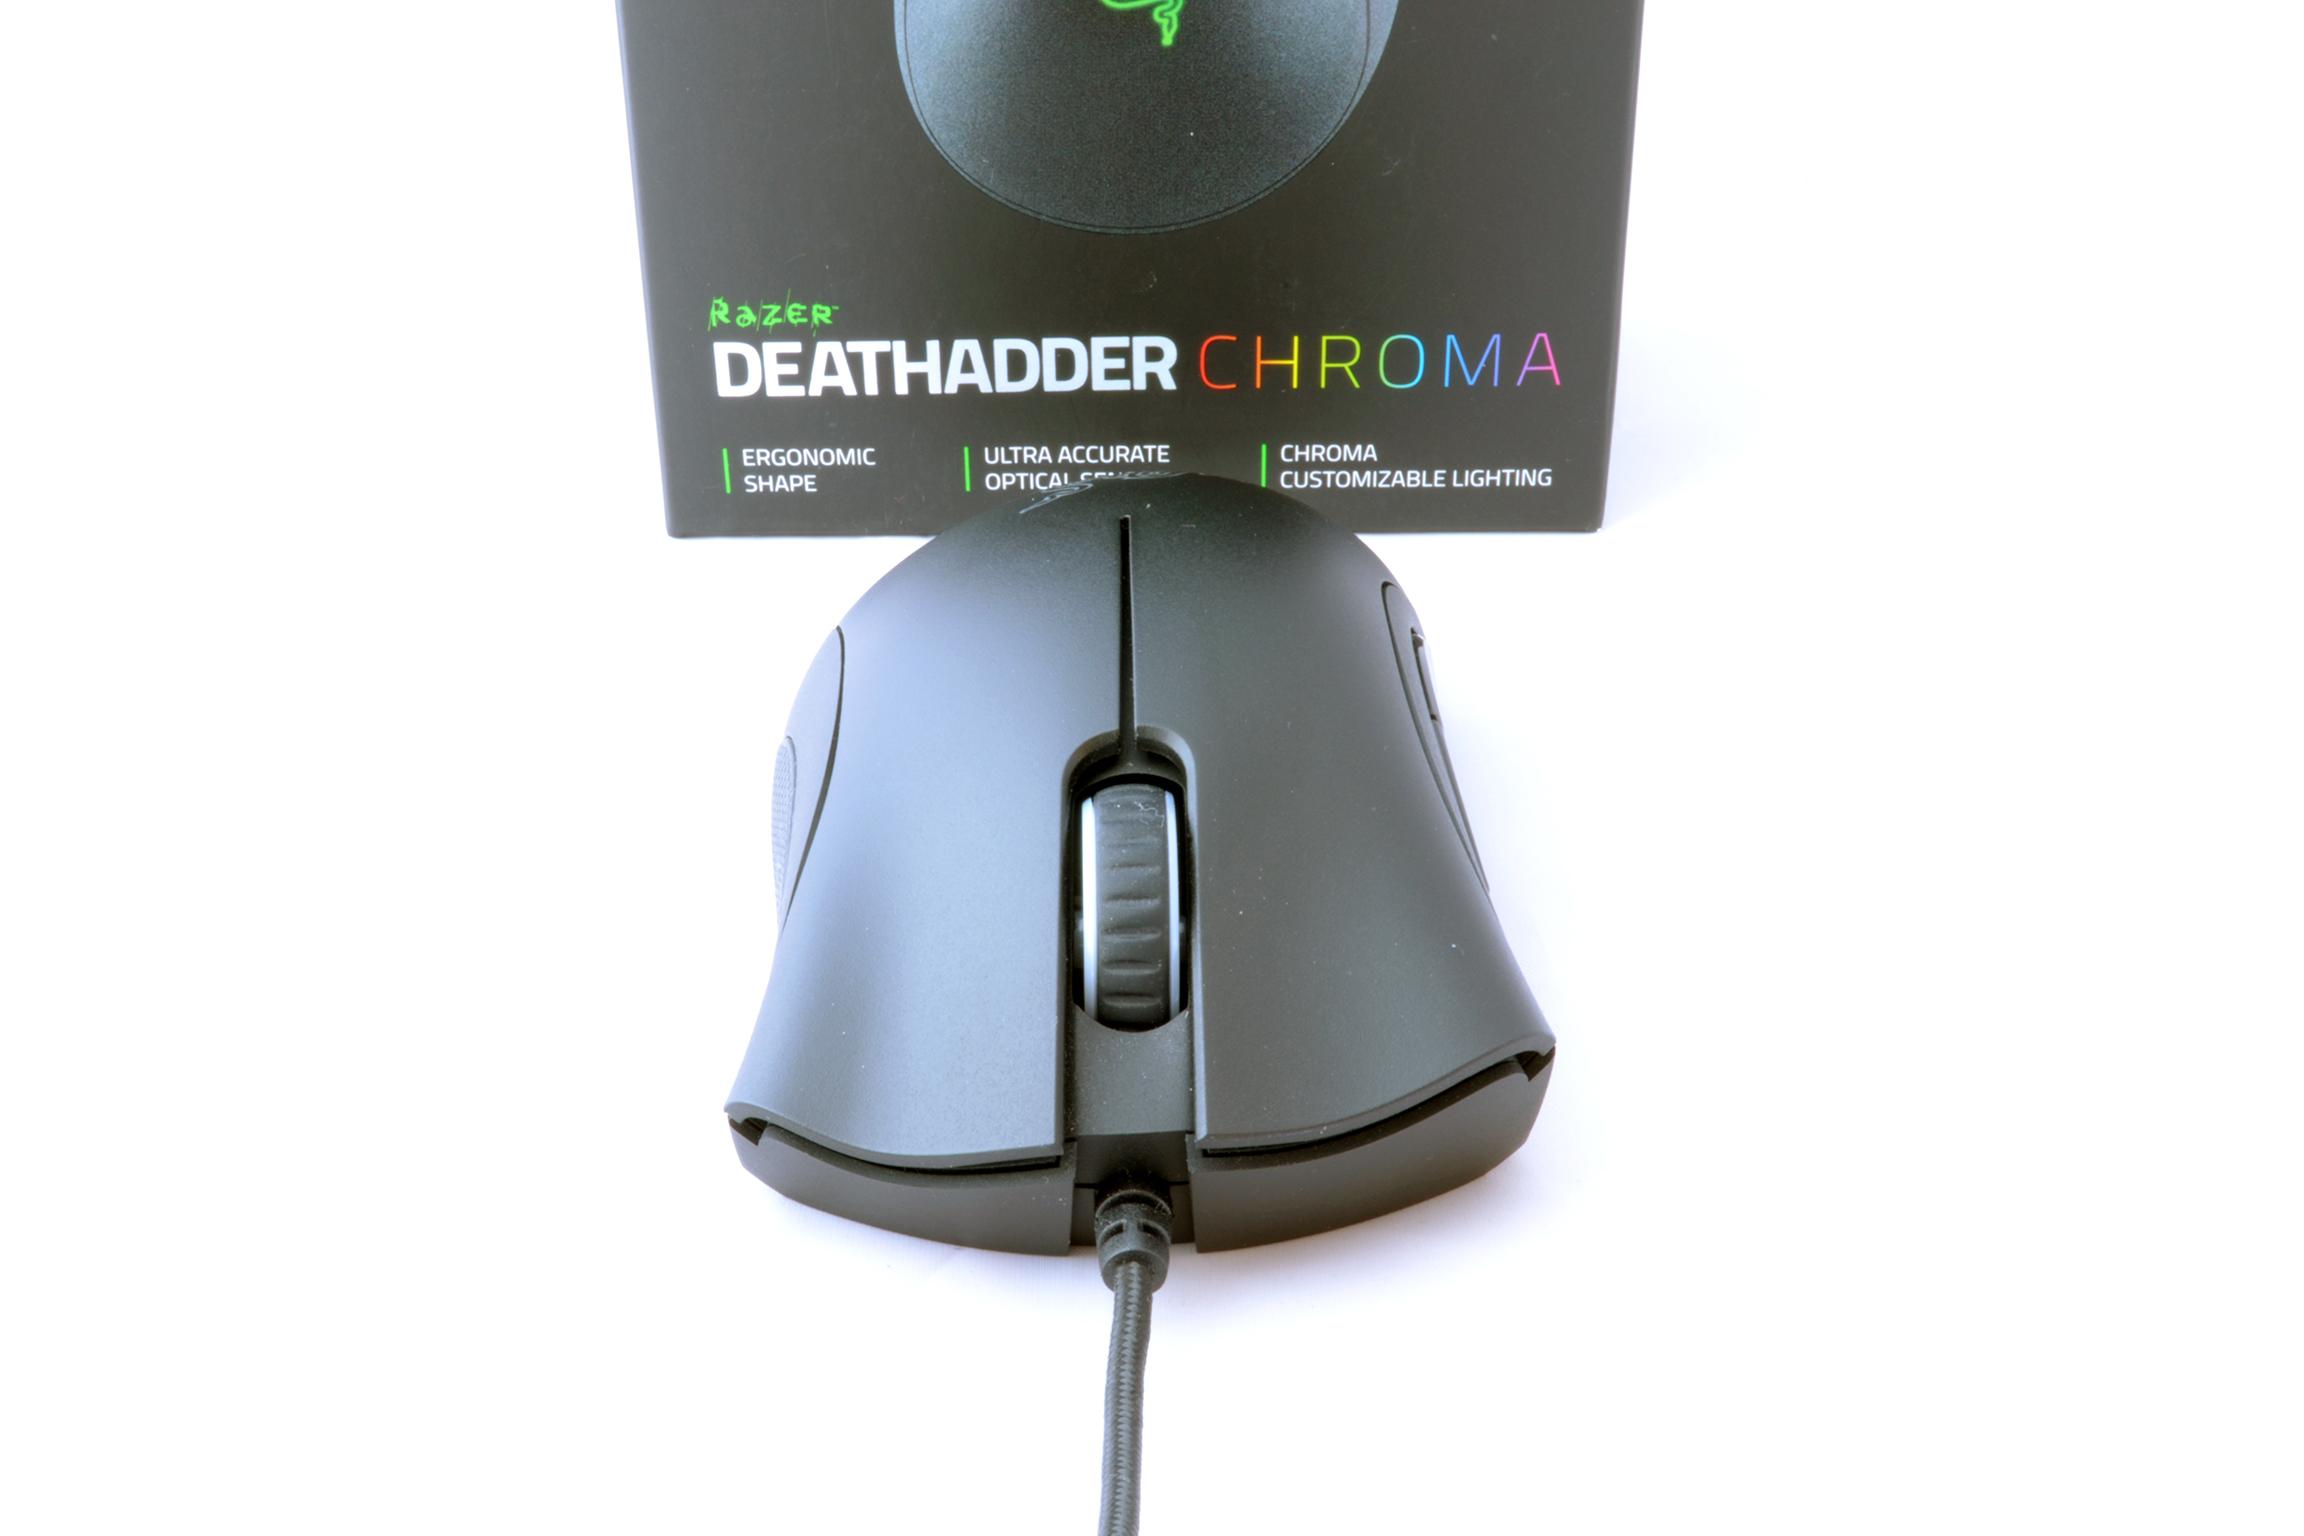 razer_deathadder_chroma_3